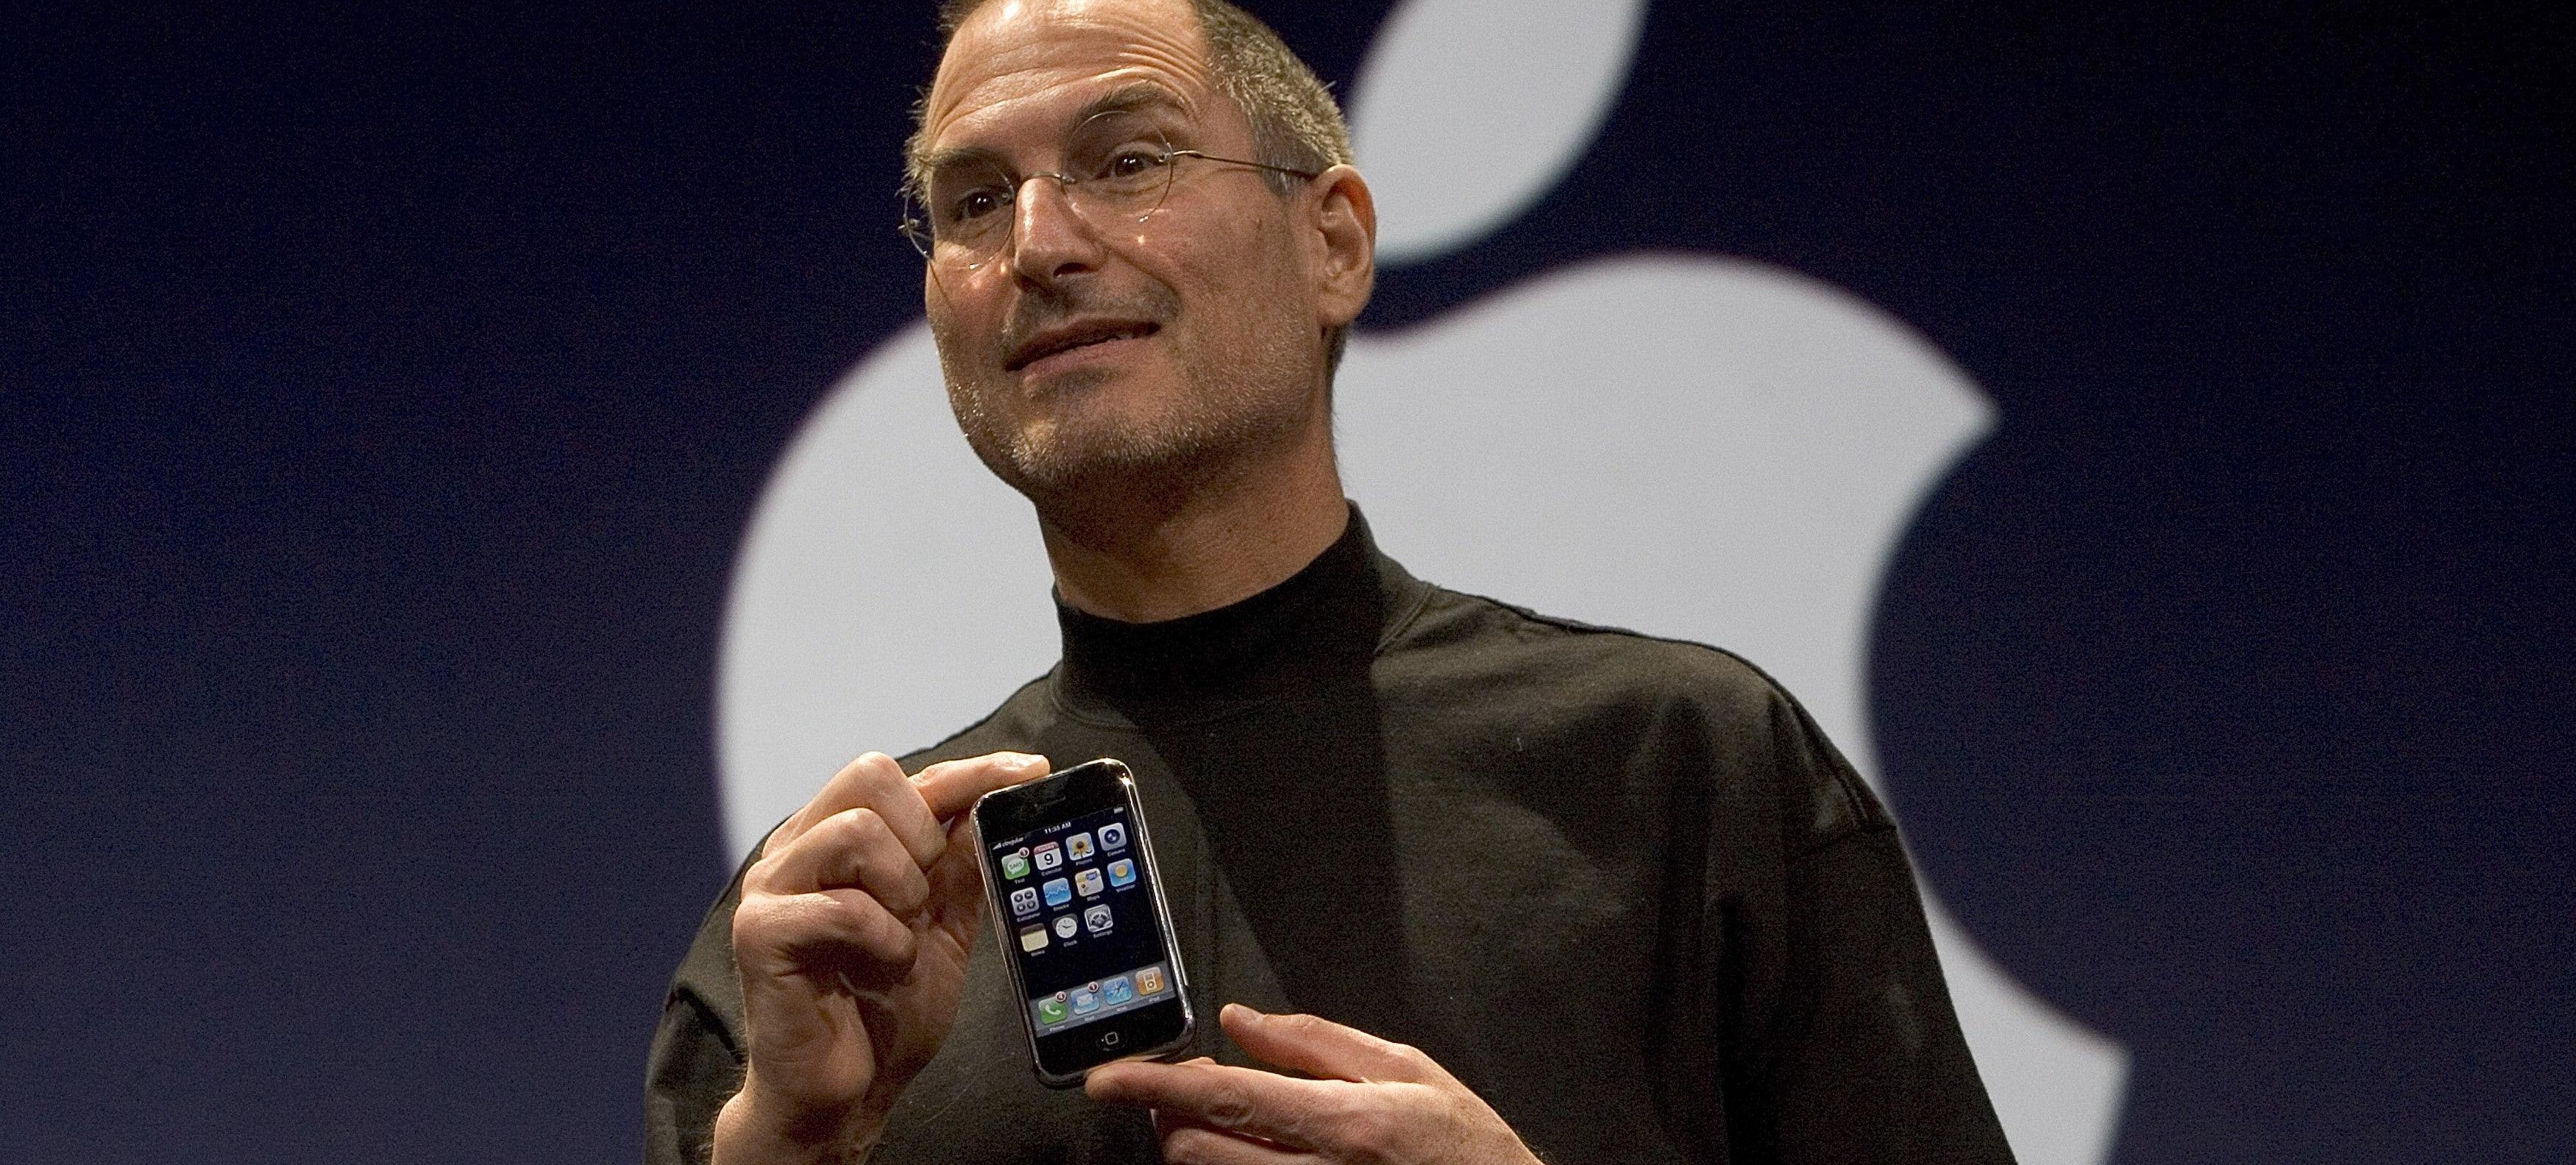 Universal Has Picked Up Aaron Sorkin's Steve Jobs Biopic